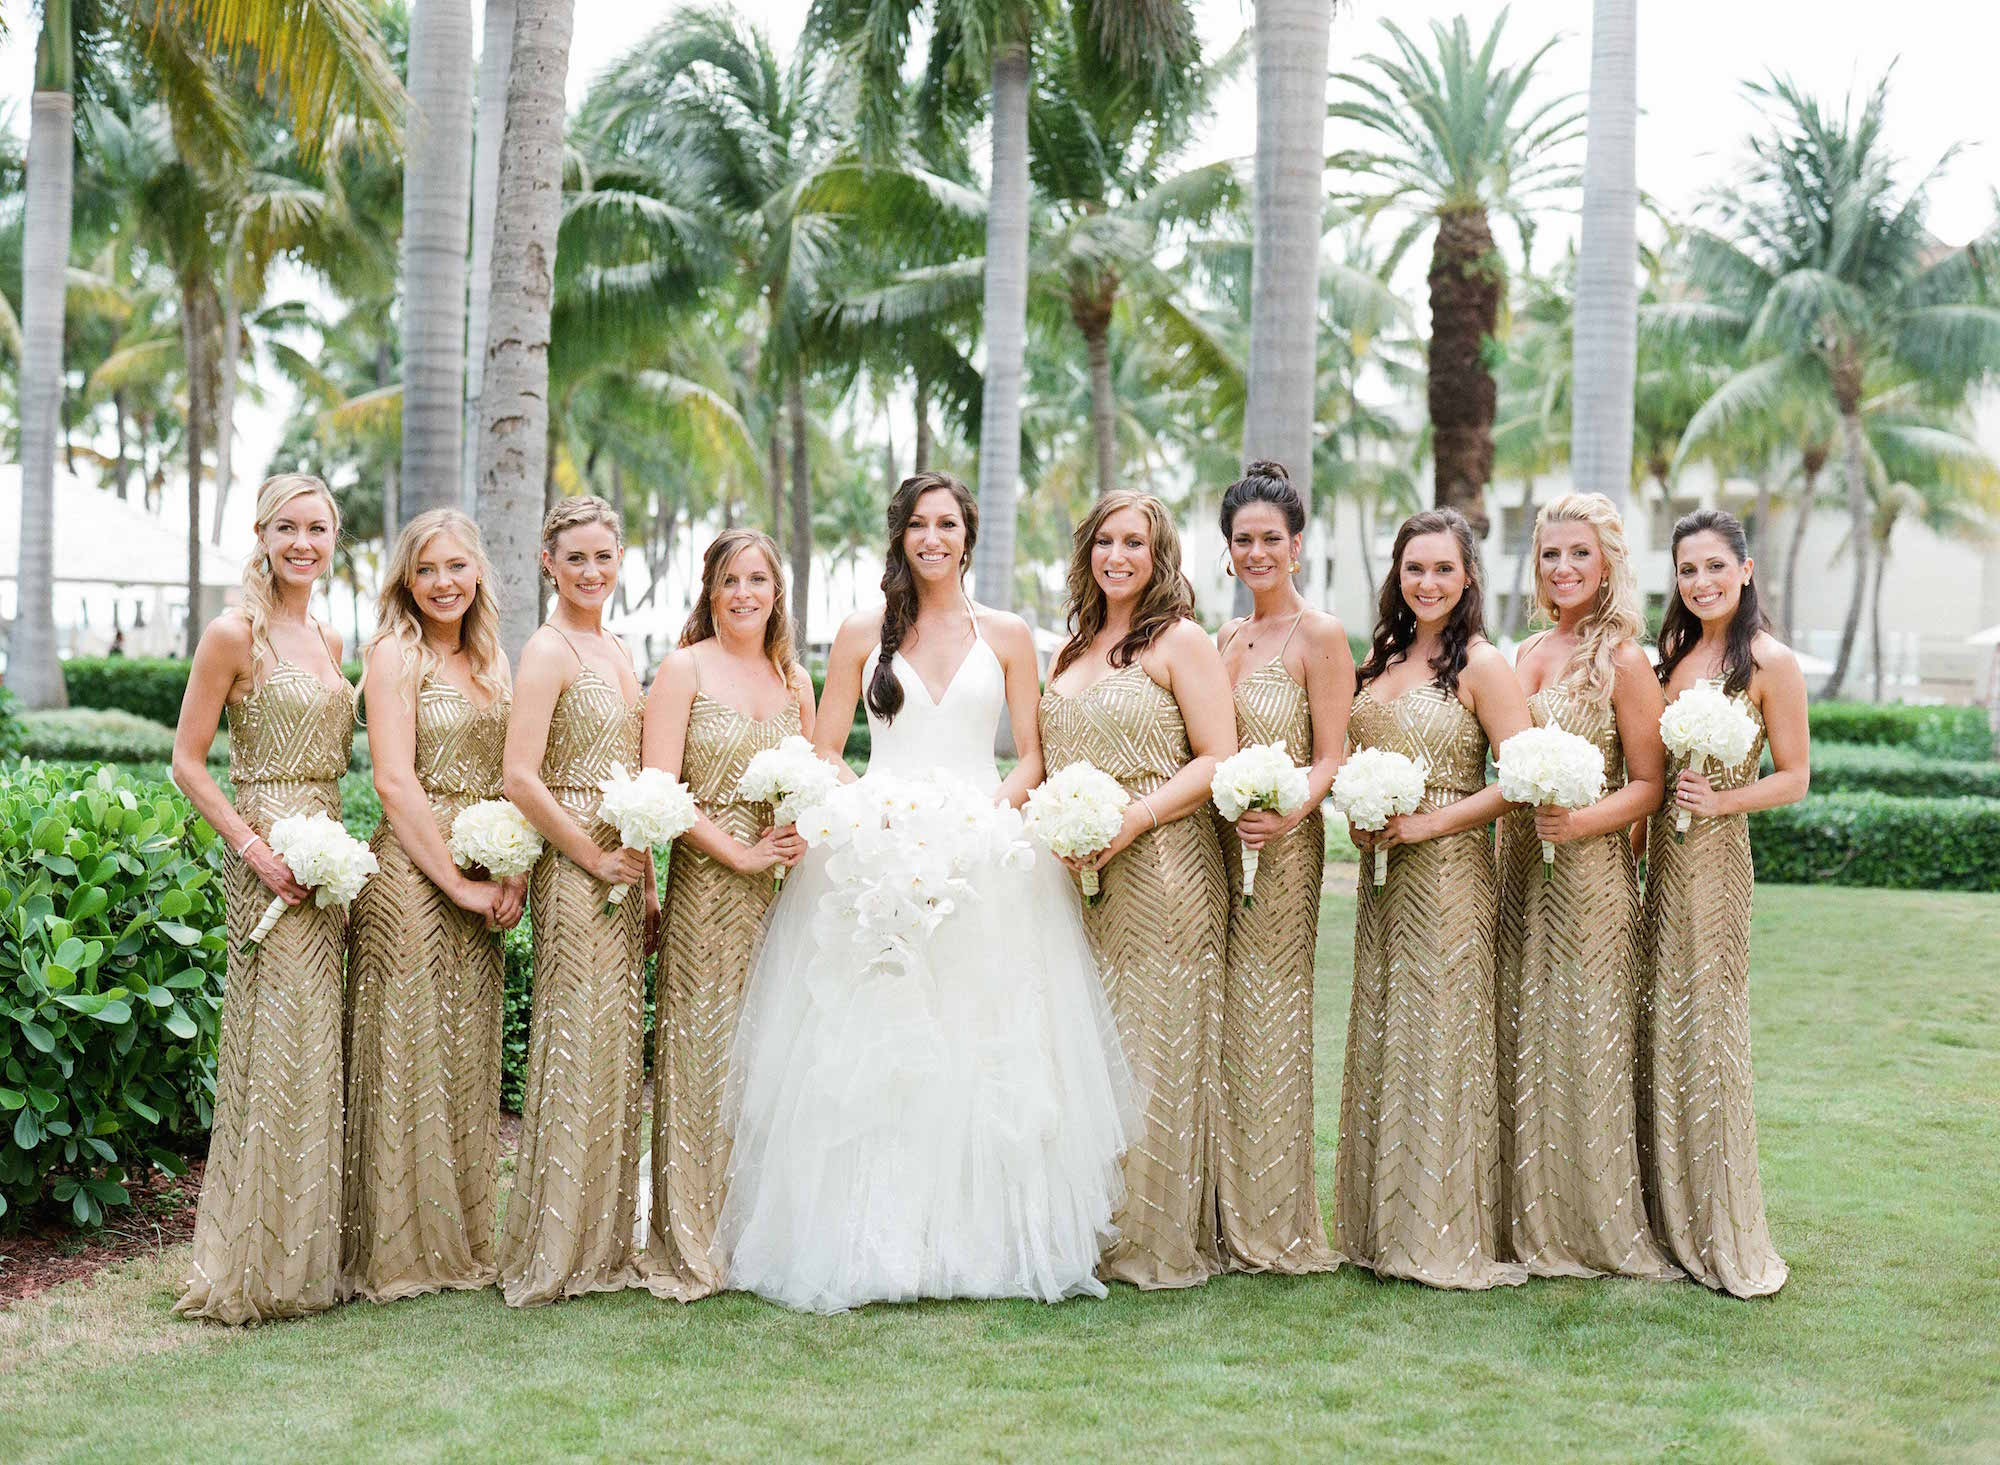 Elegant Destination Wedding With Beach Ceremony Gilded Reception